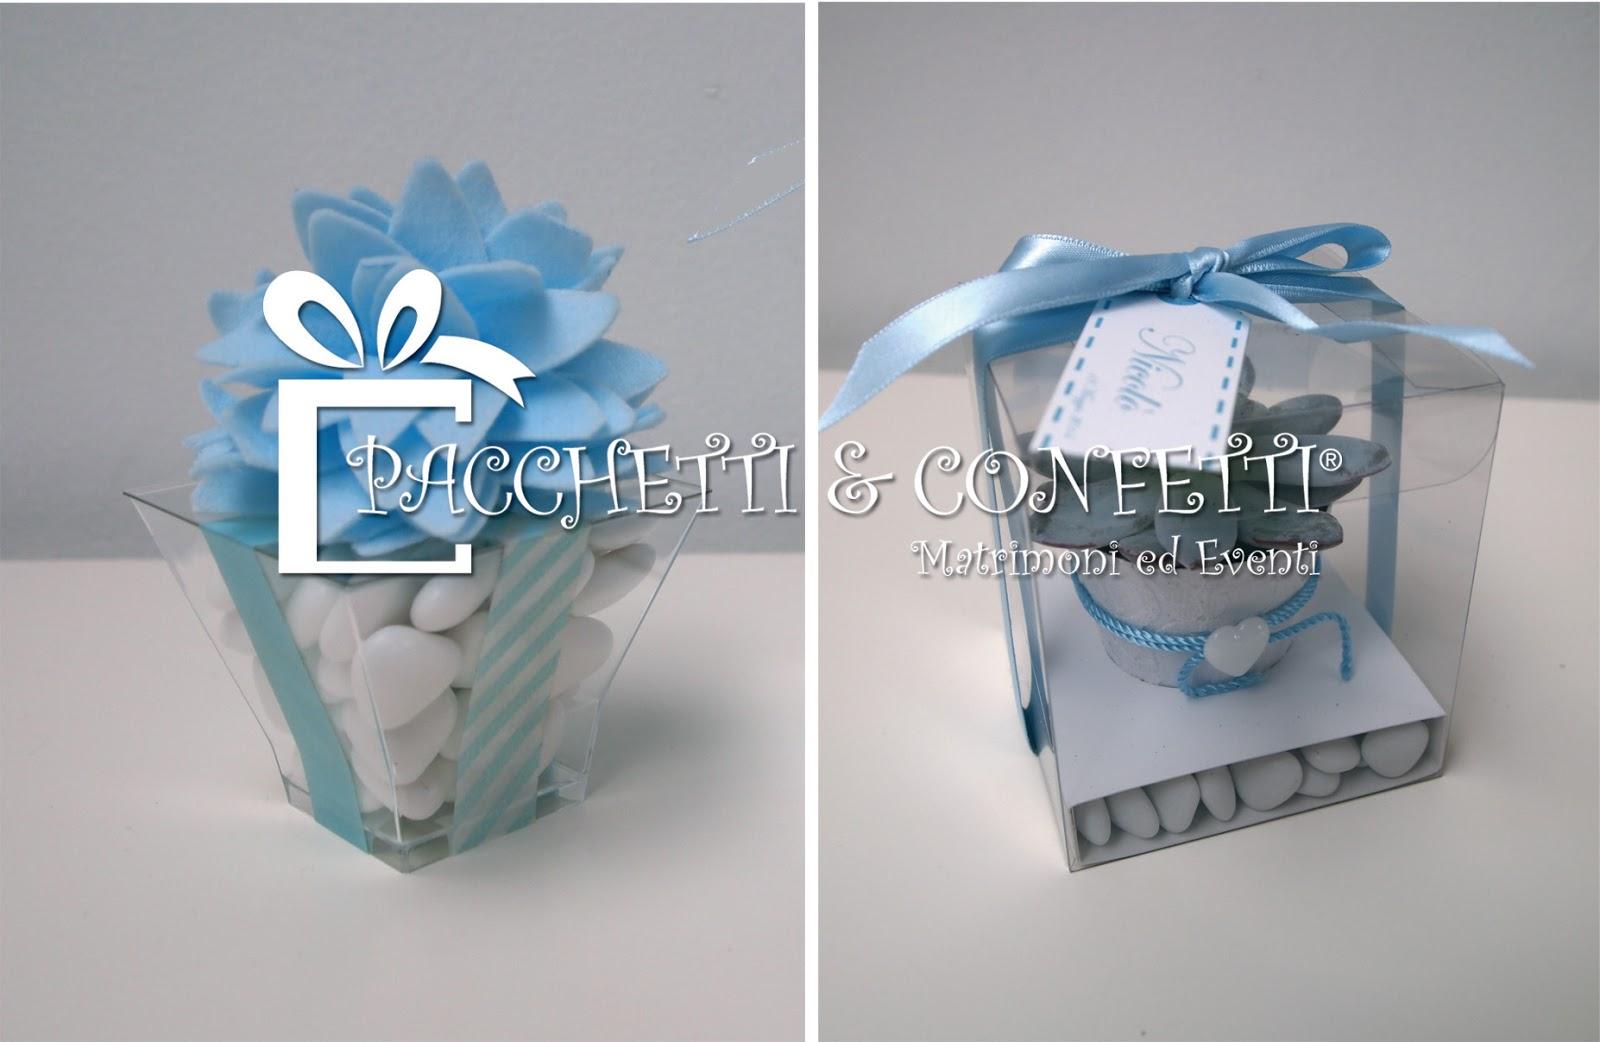 Pacchetti e confetti bomboniere battesimo bimbo - Idee per battesimo bimbo ...